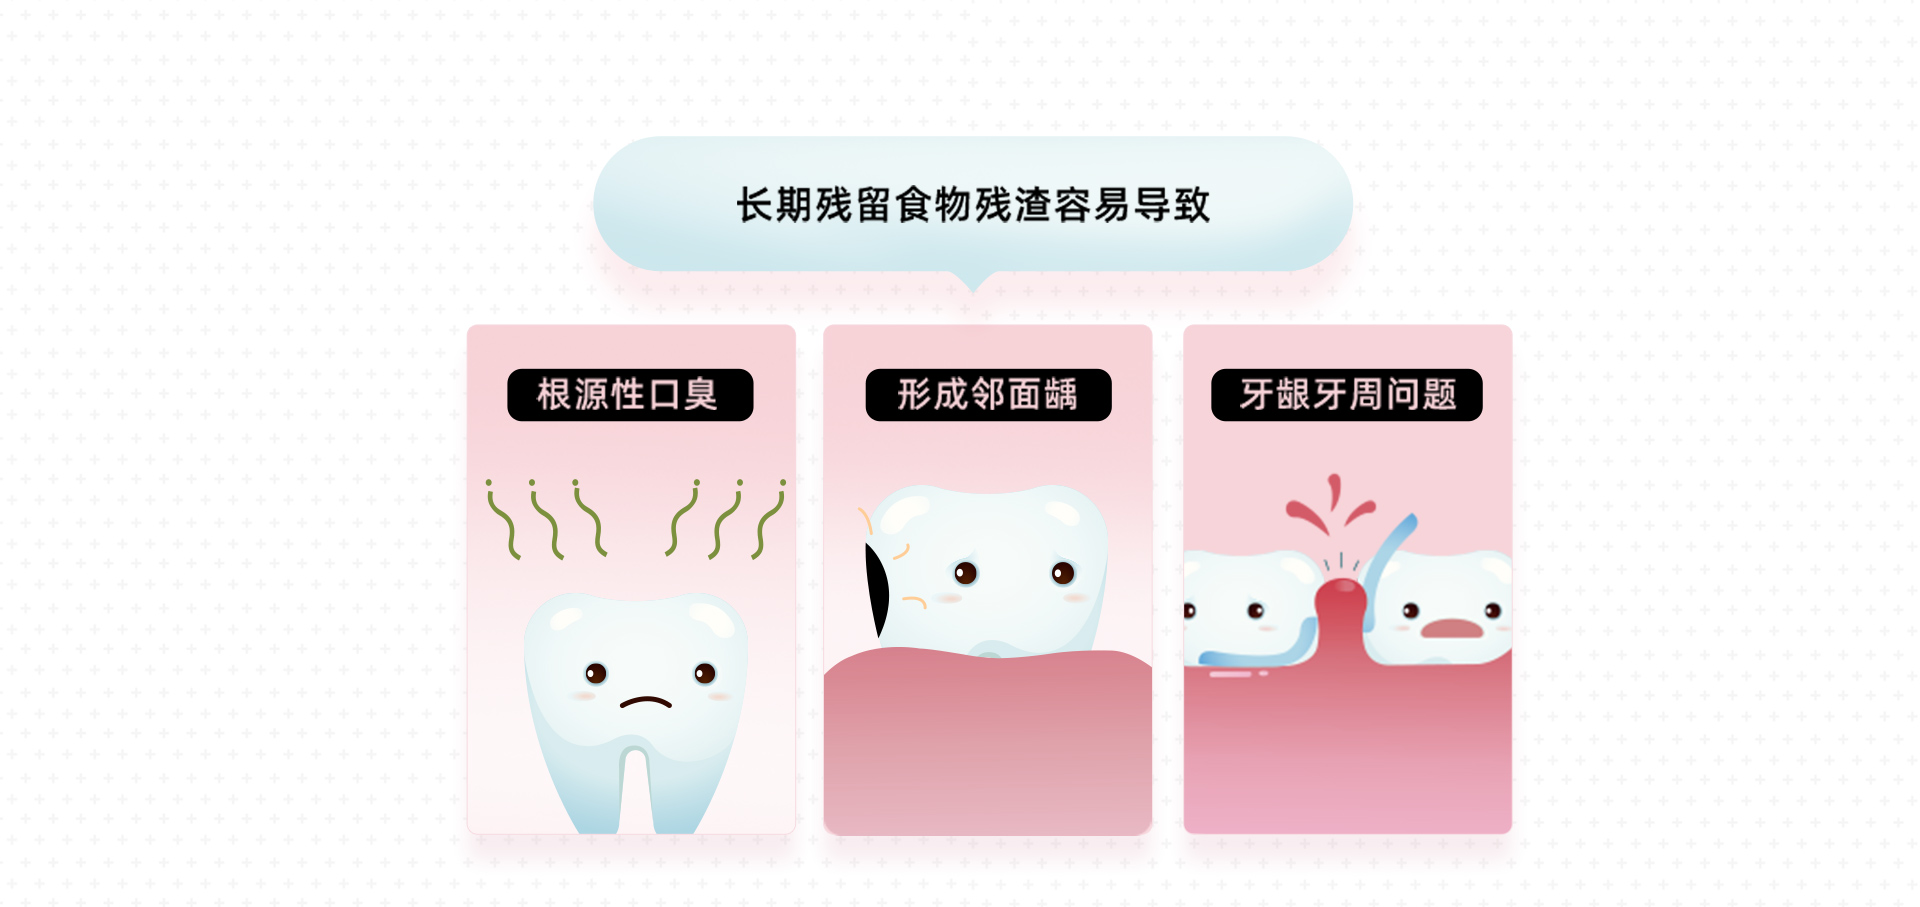 usmile电动牙刷_为什么牙线是必需品